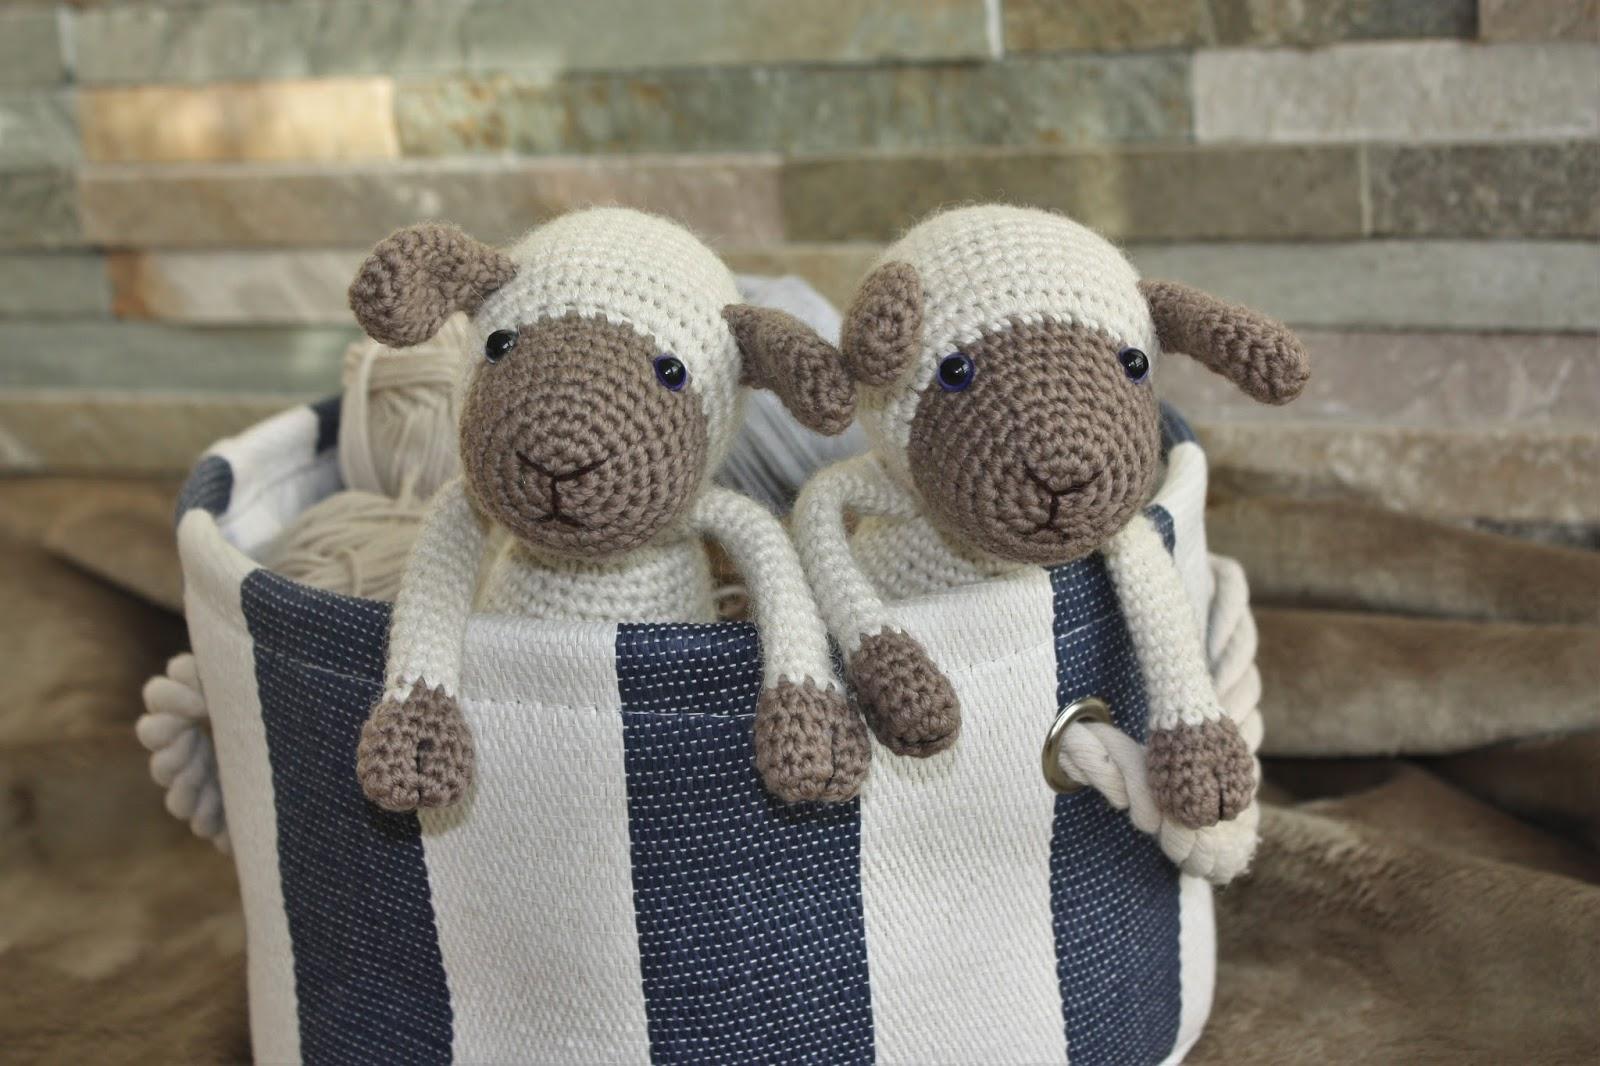 Happyamigurumi: New Amigurumi Sheep Pattern